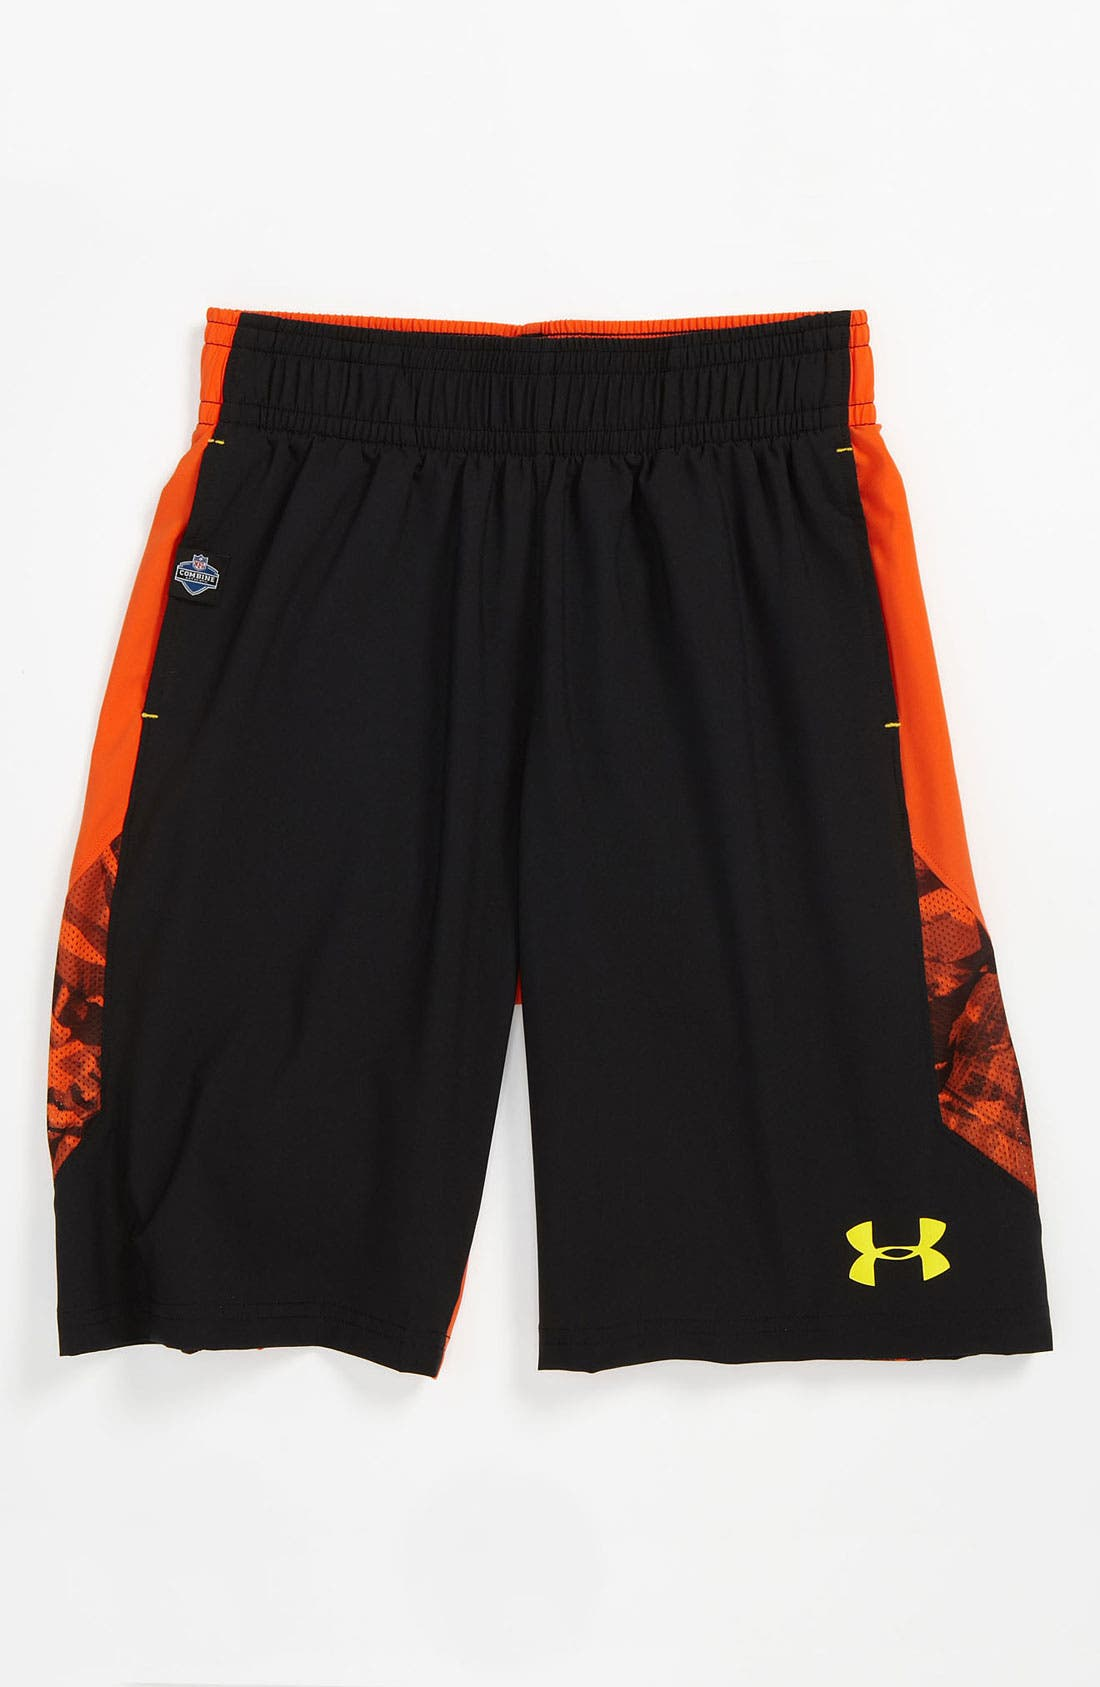 Main Image - Under Armour 'NFL Combine' Shorts (Big Boys)